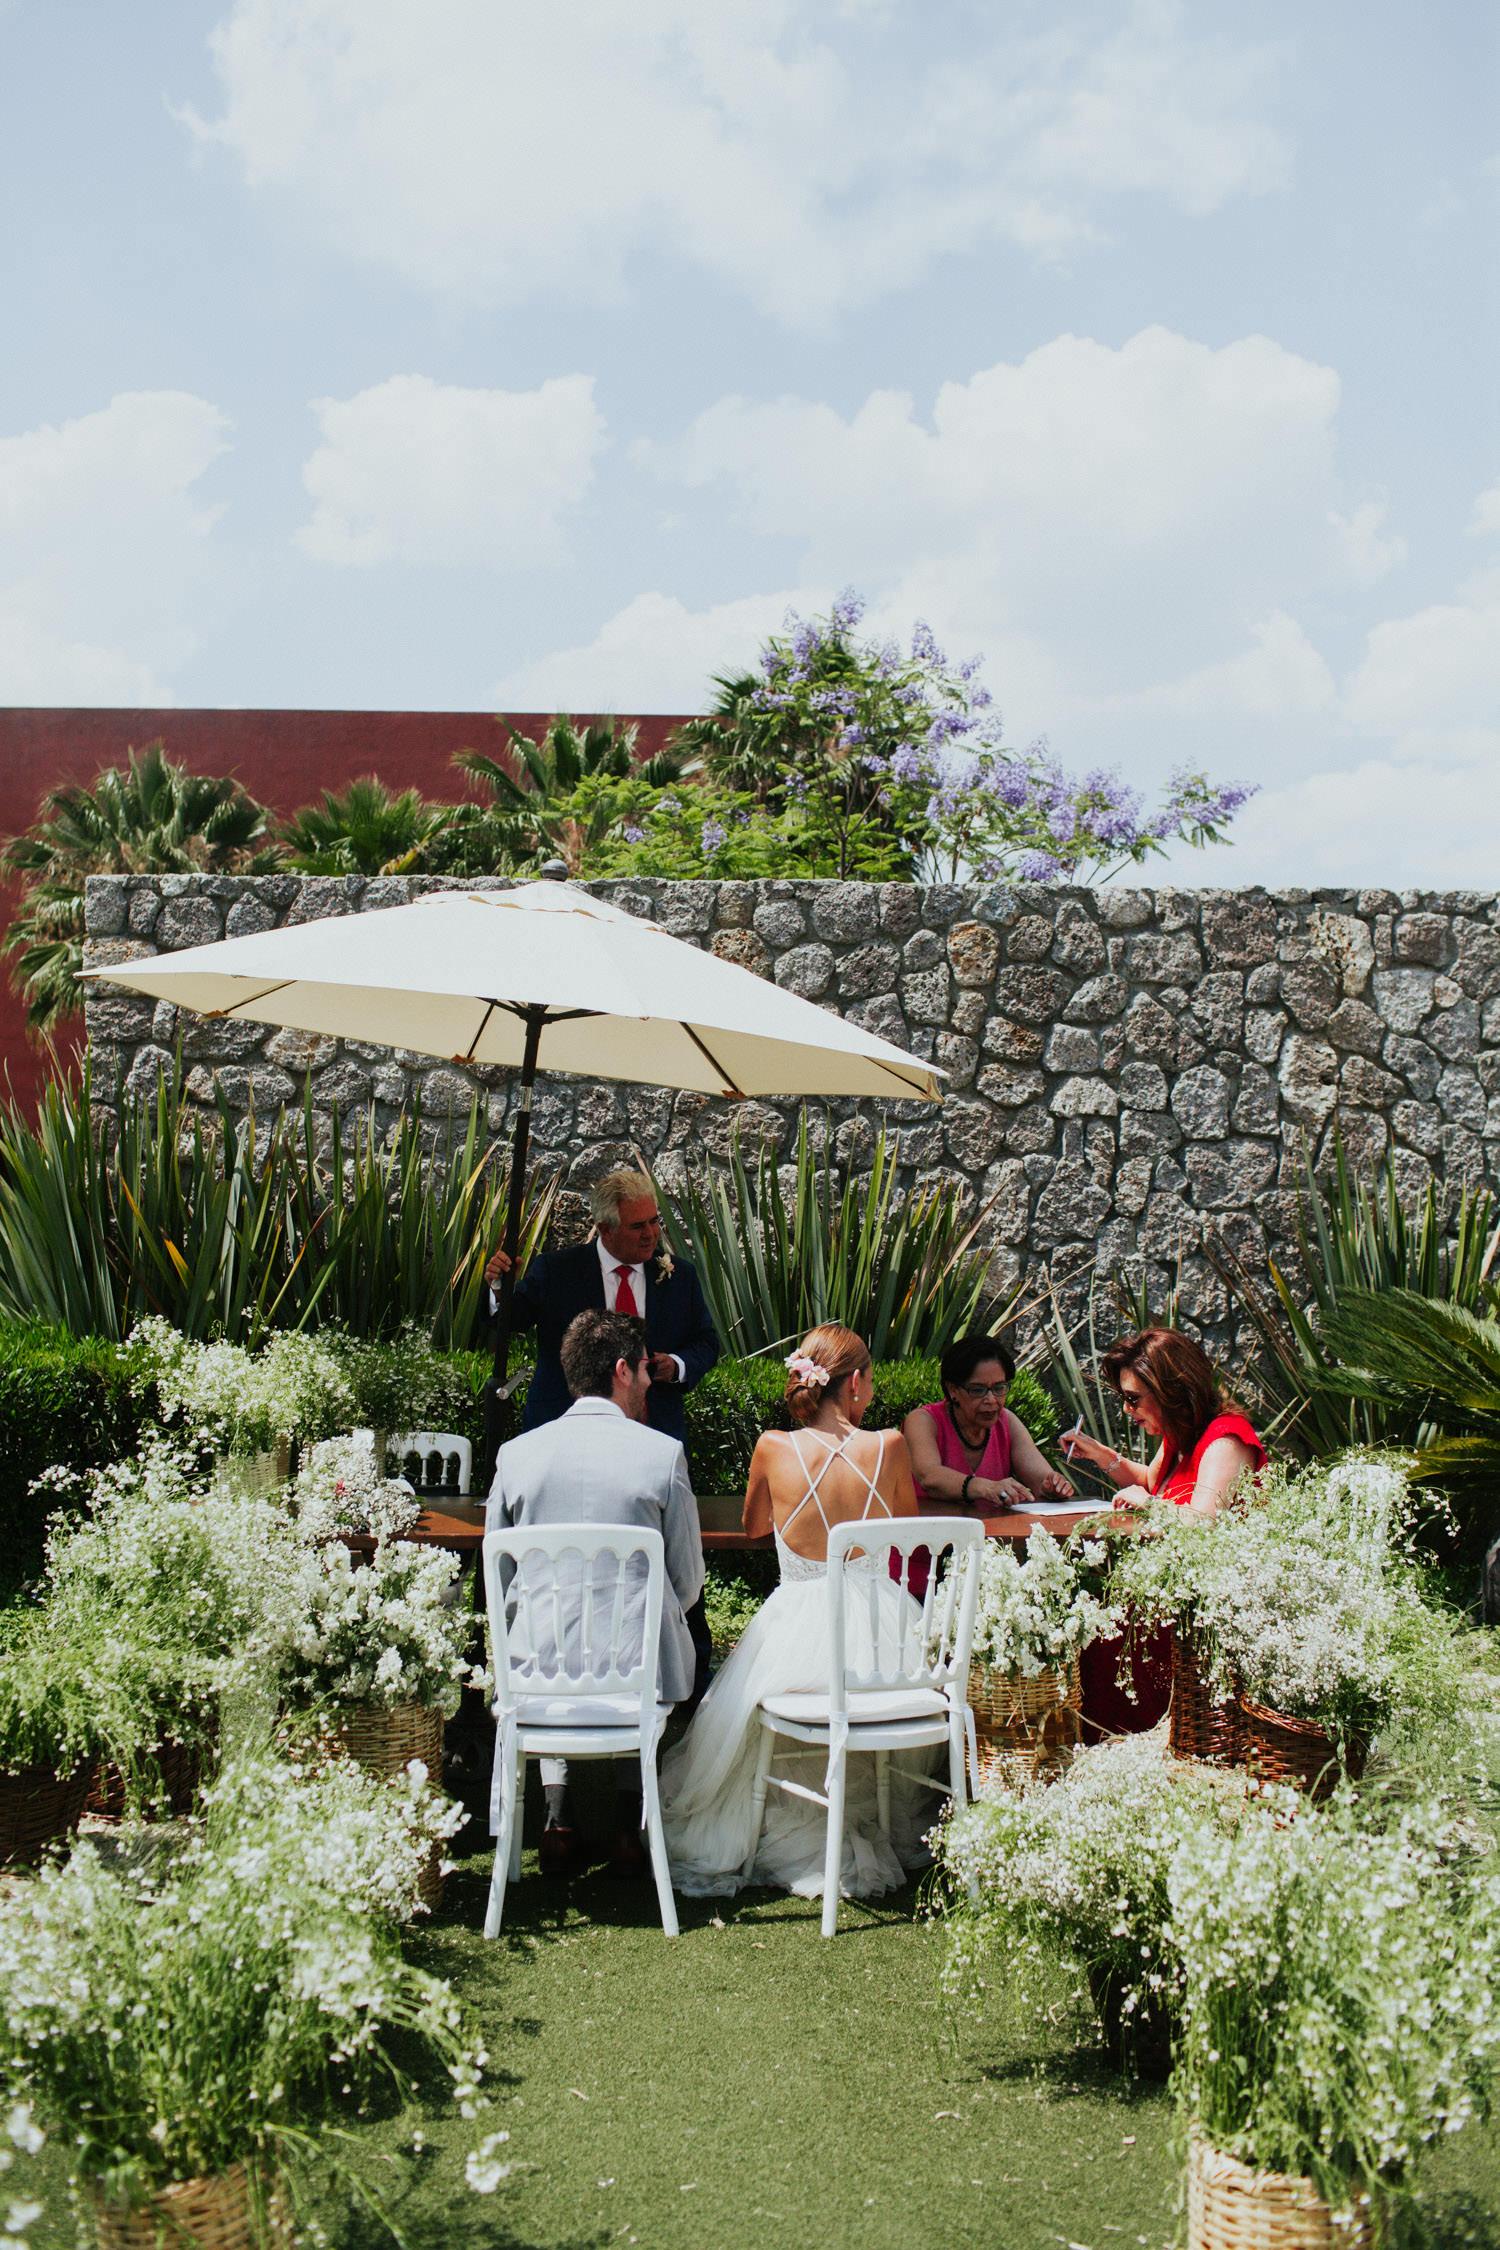 Boda-Guanajuato-Fotografia-Casa-de-Piedra-Leon-San-Miguel-Allende-Mariana-Jorge-Pierce-0054.JPG